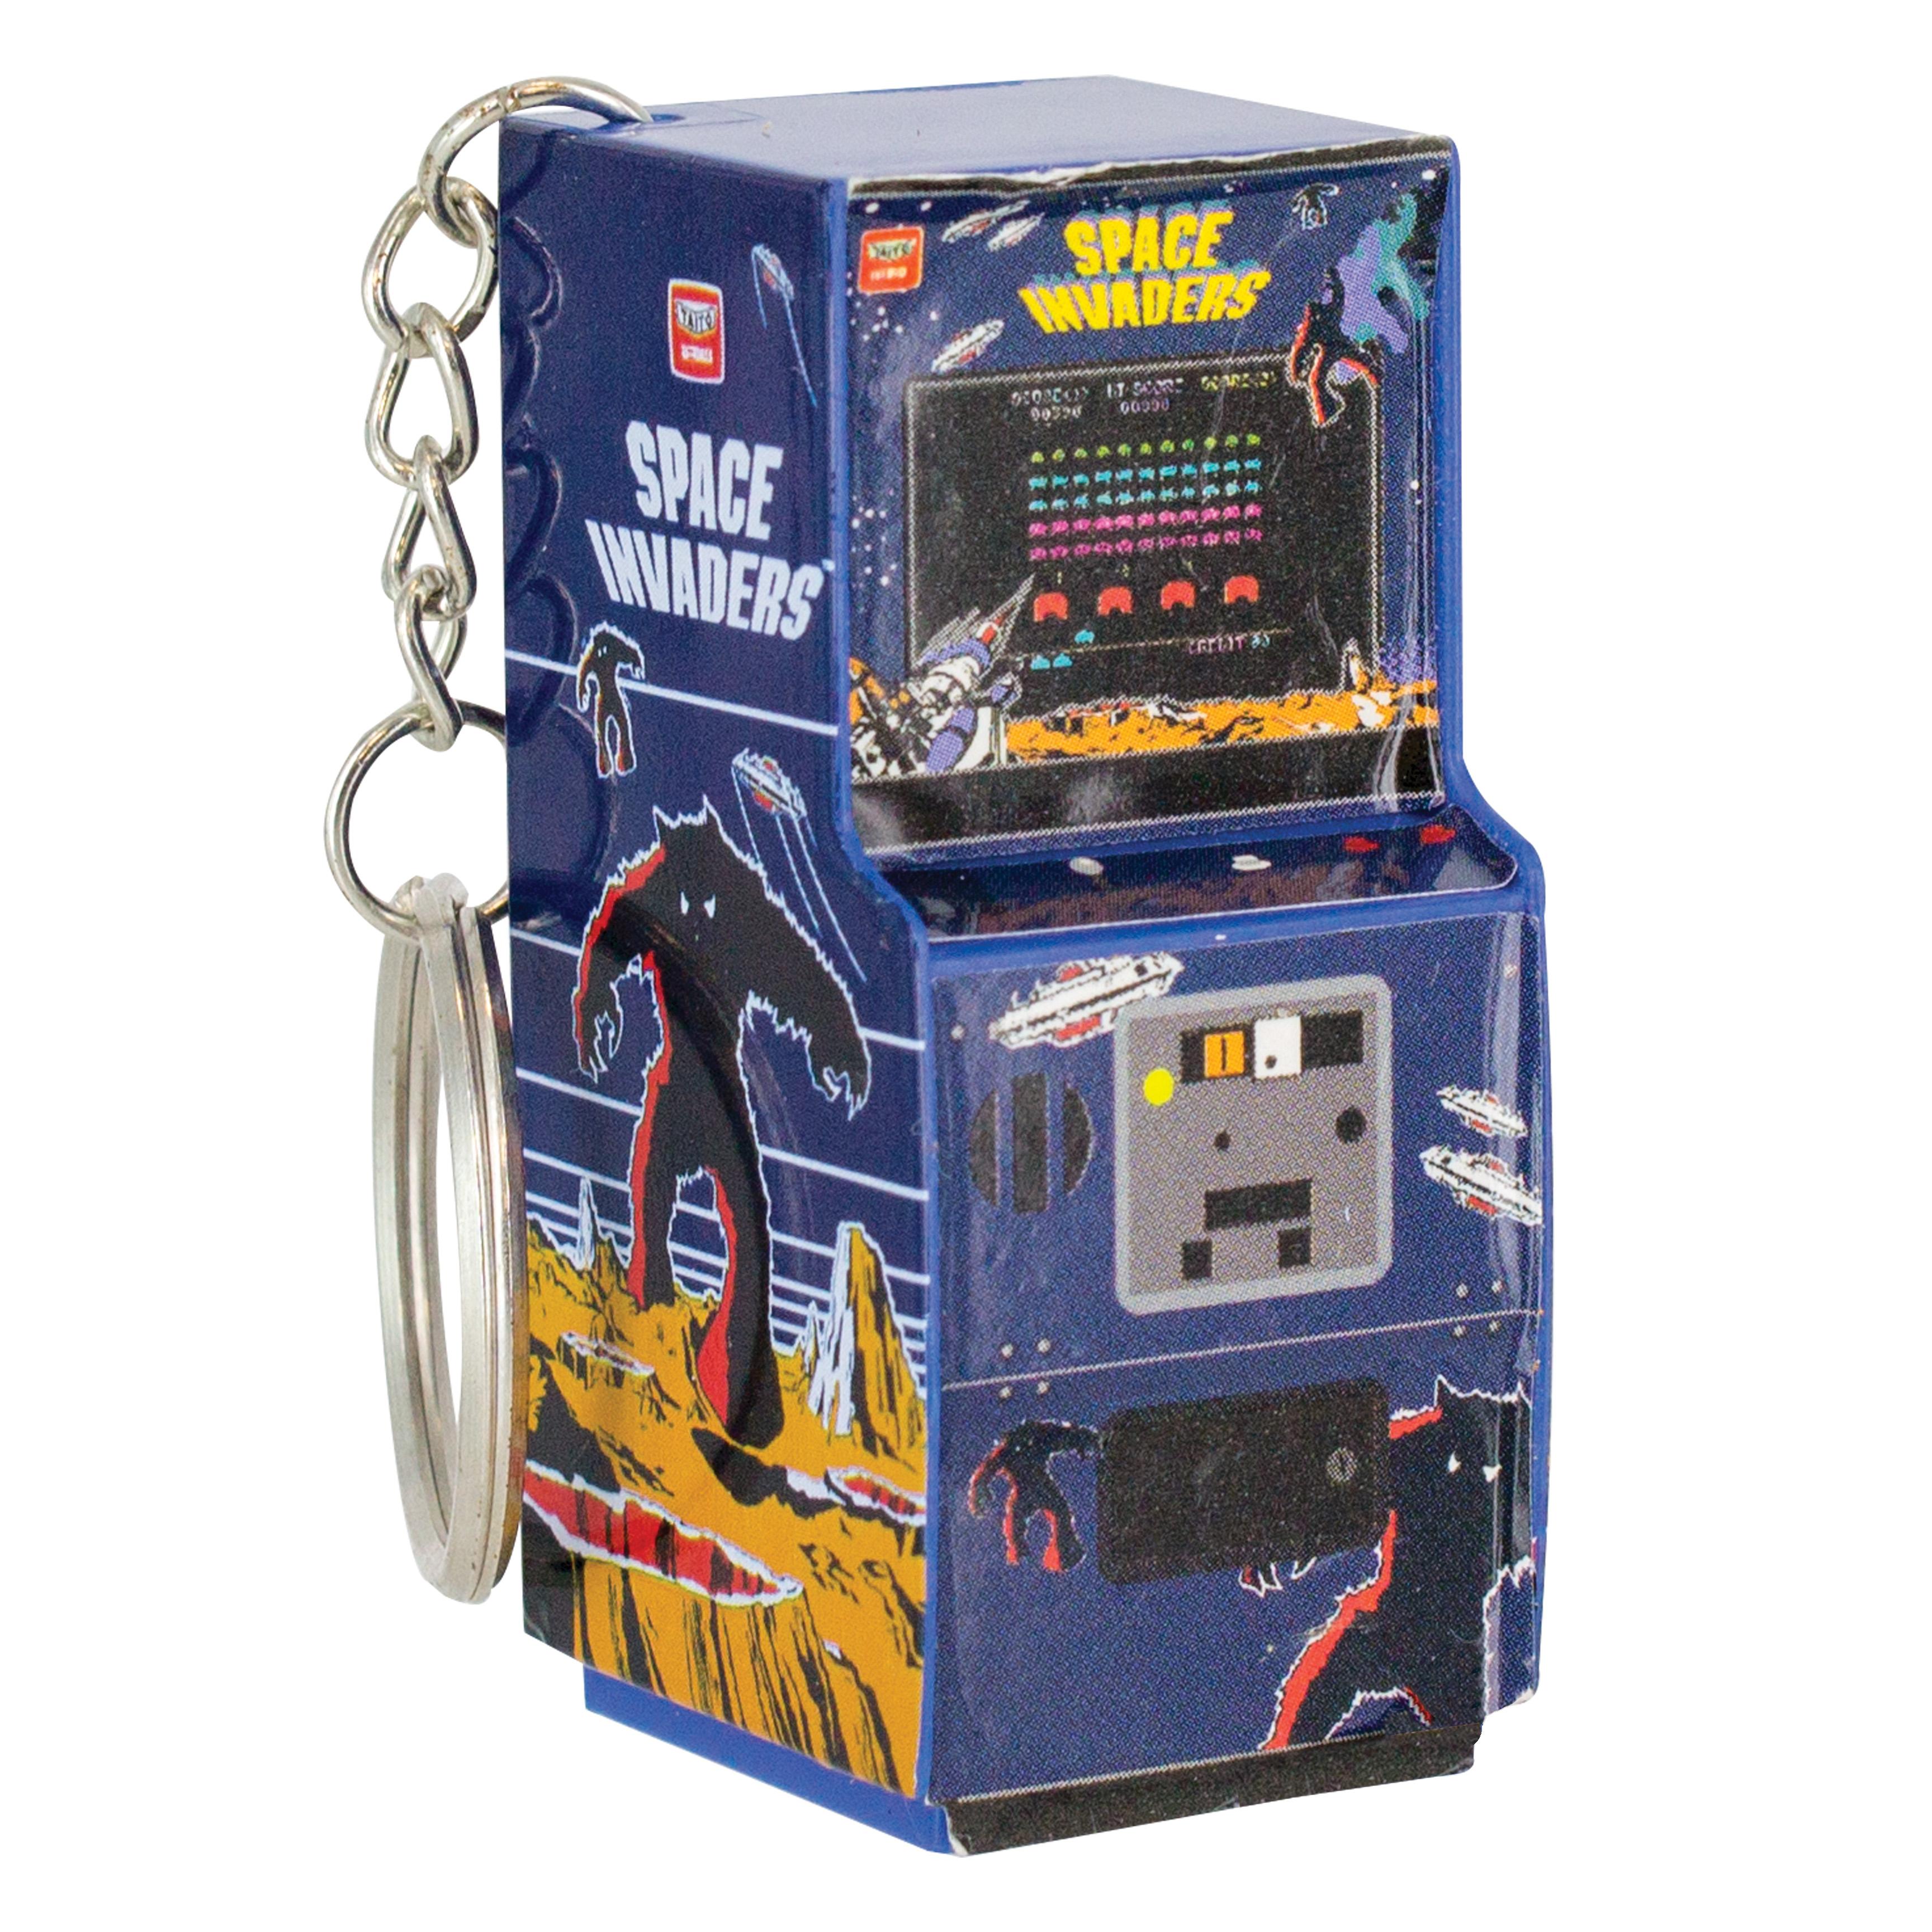 Space Invaders Arcade Brelok